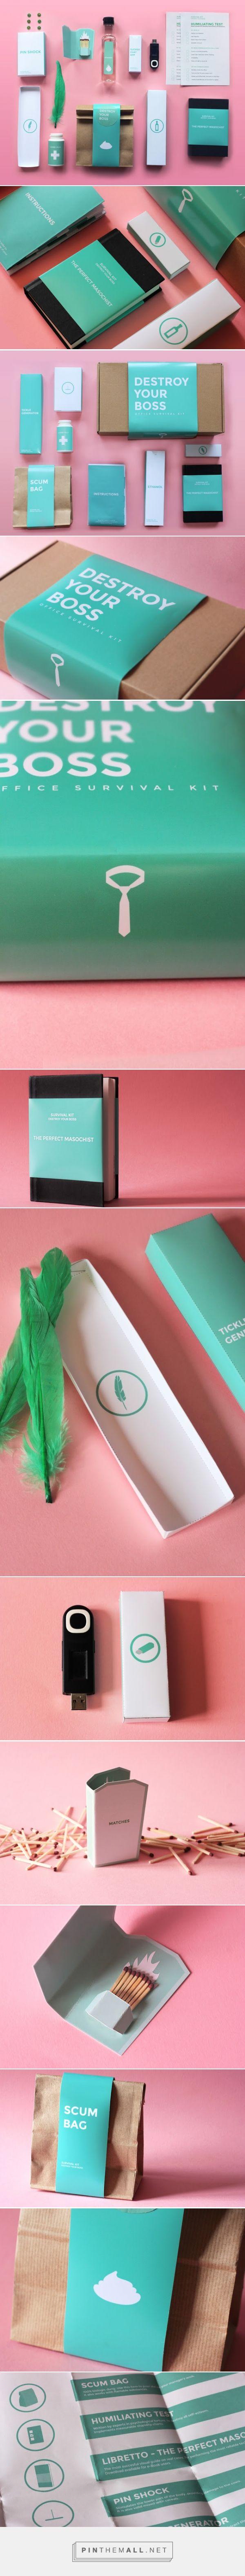 Destroy Your Boss kit concept designed by DesignerAtDeep - http://www.packagingoftheworld.com/2015/09/destroy-your-boss-office-survival-kit.html